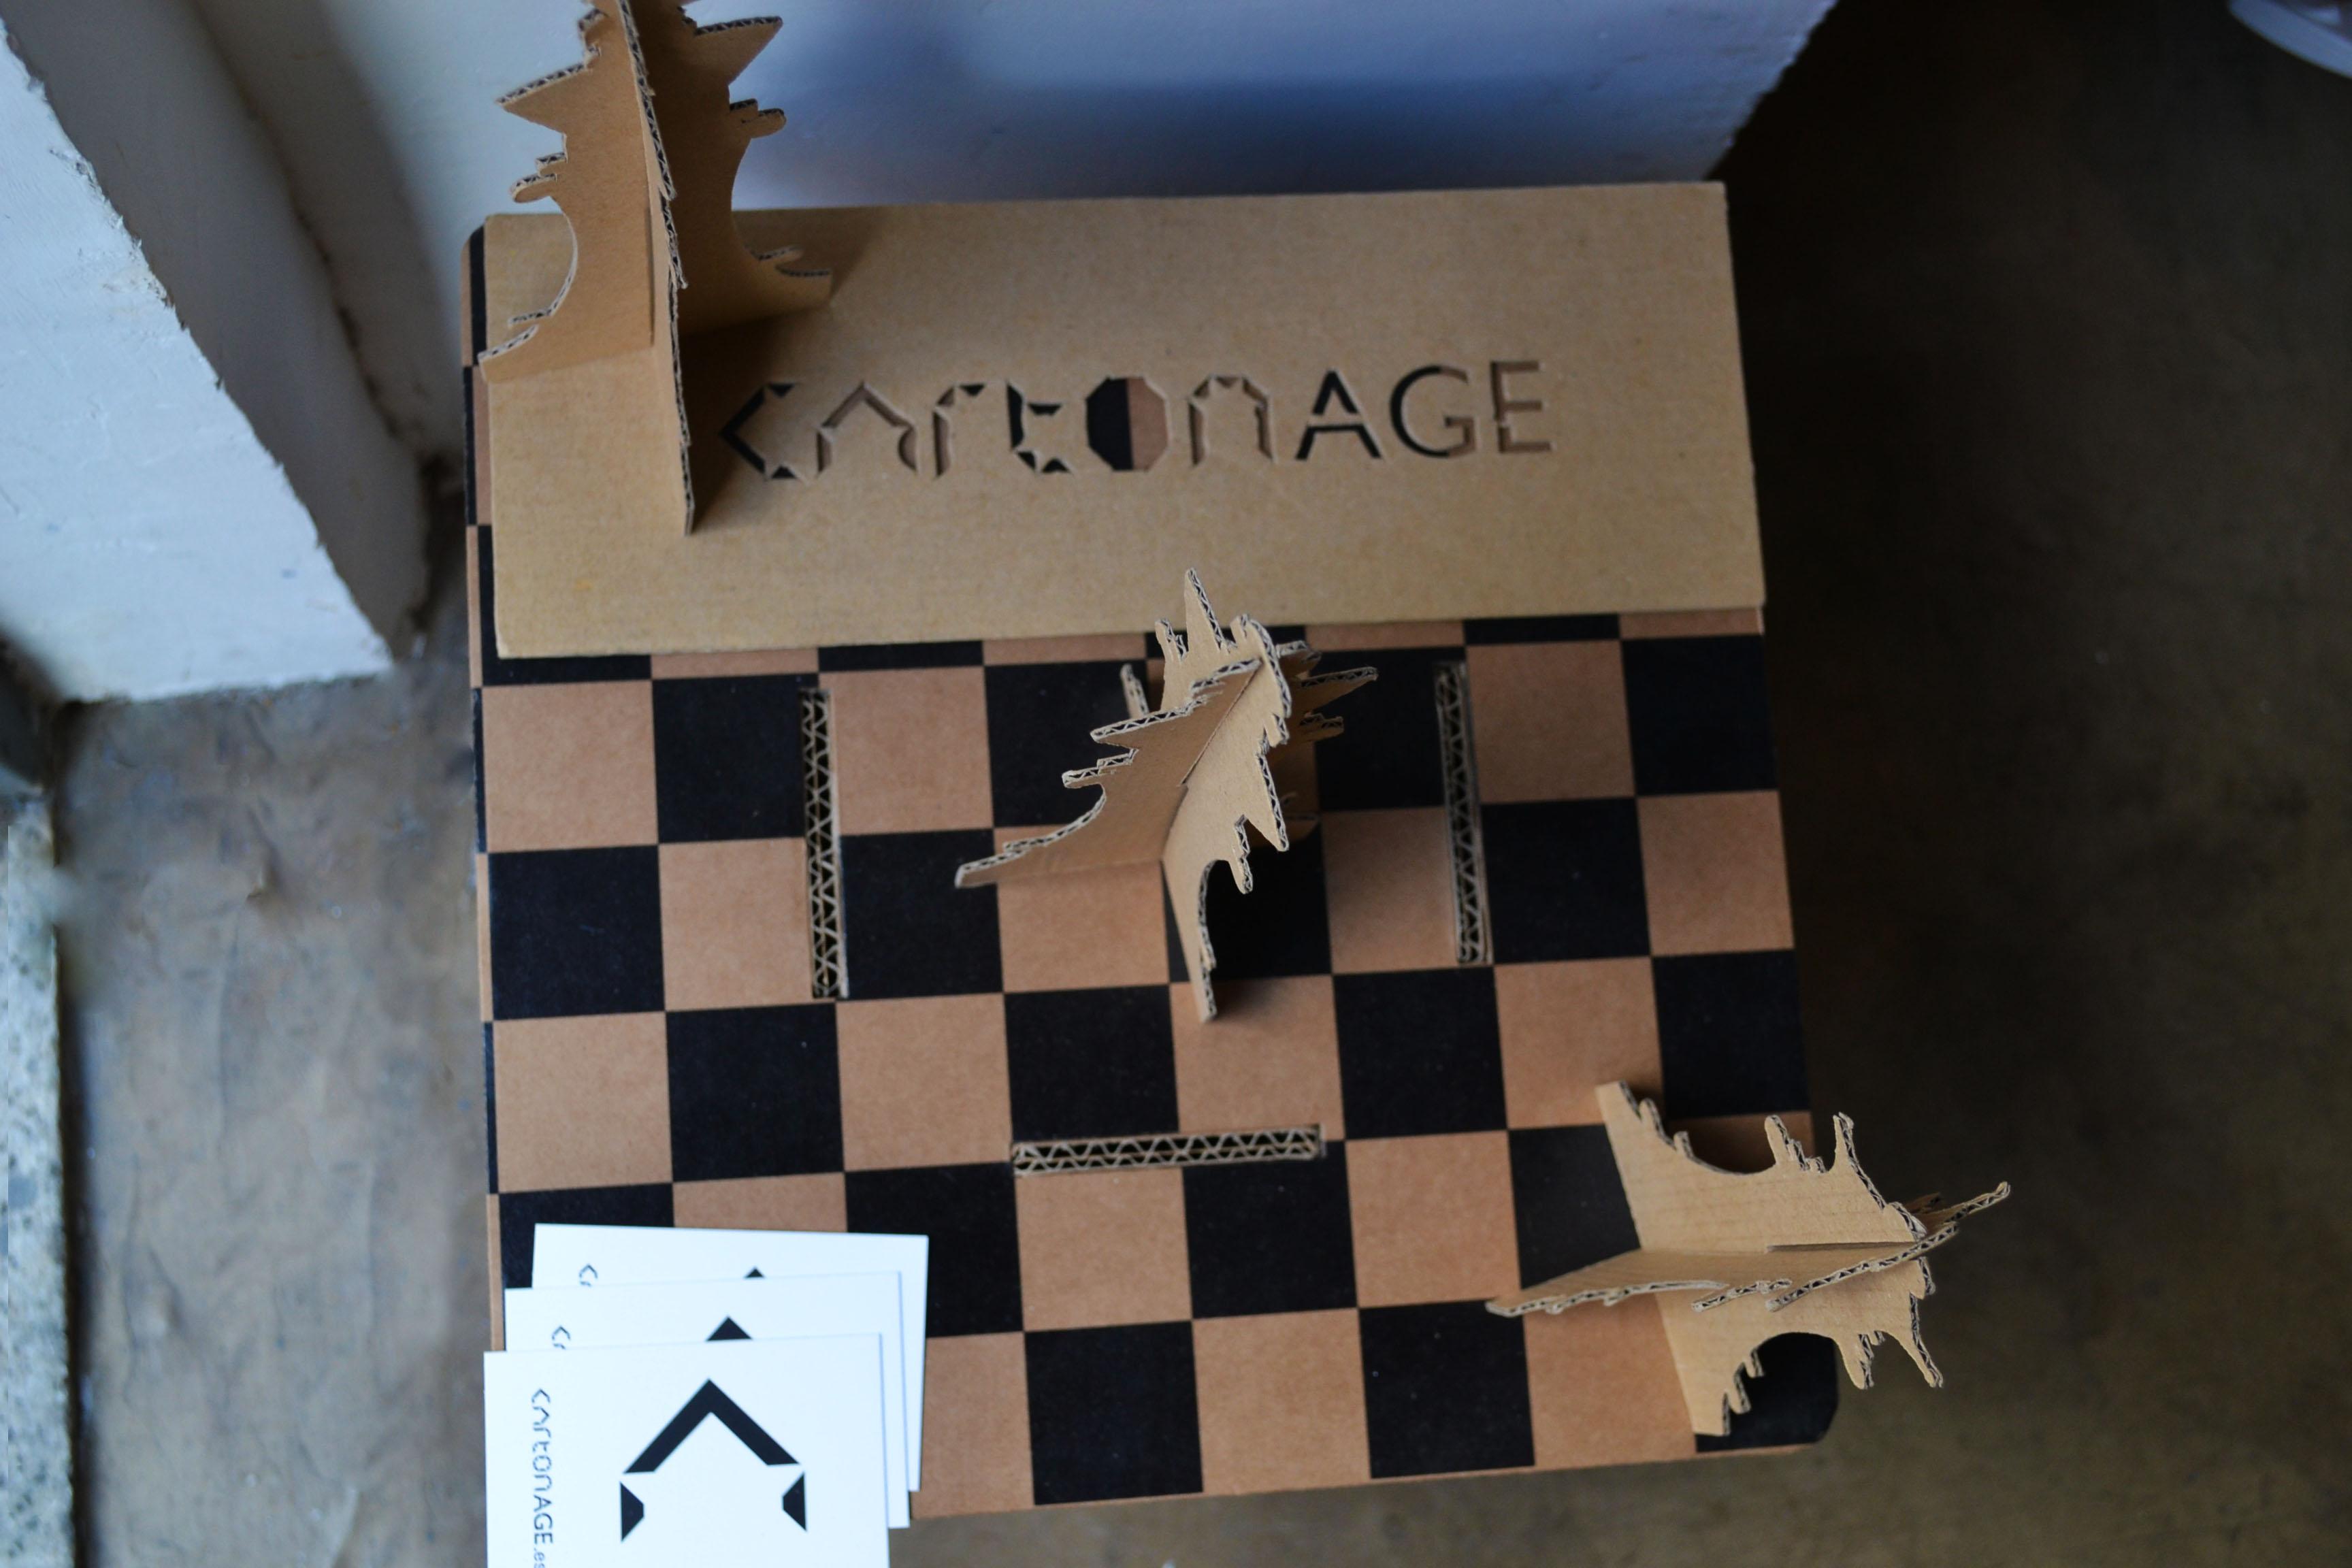 CartonAge